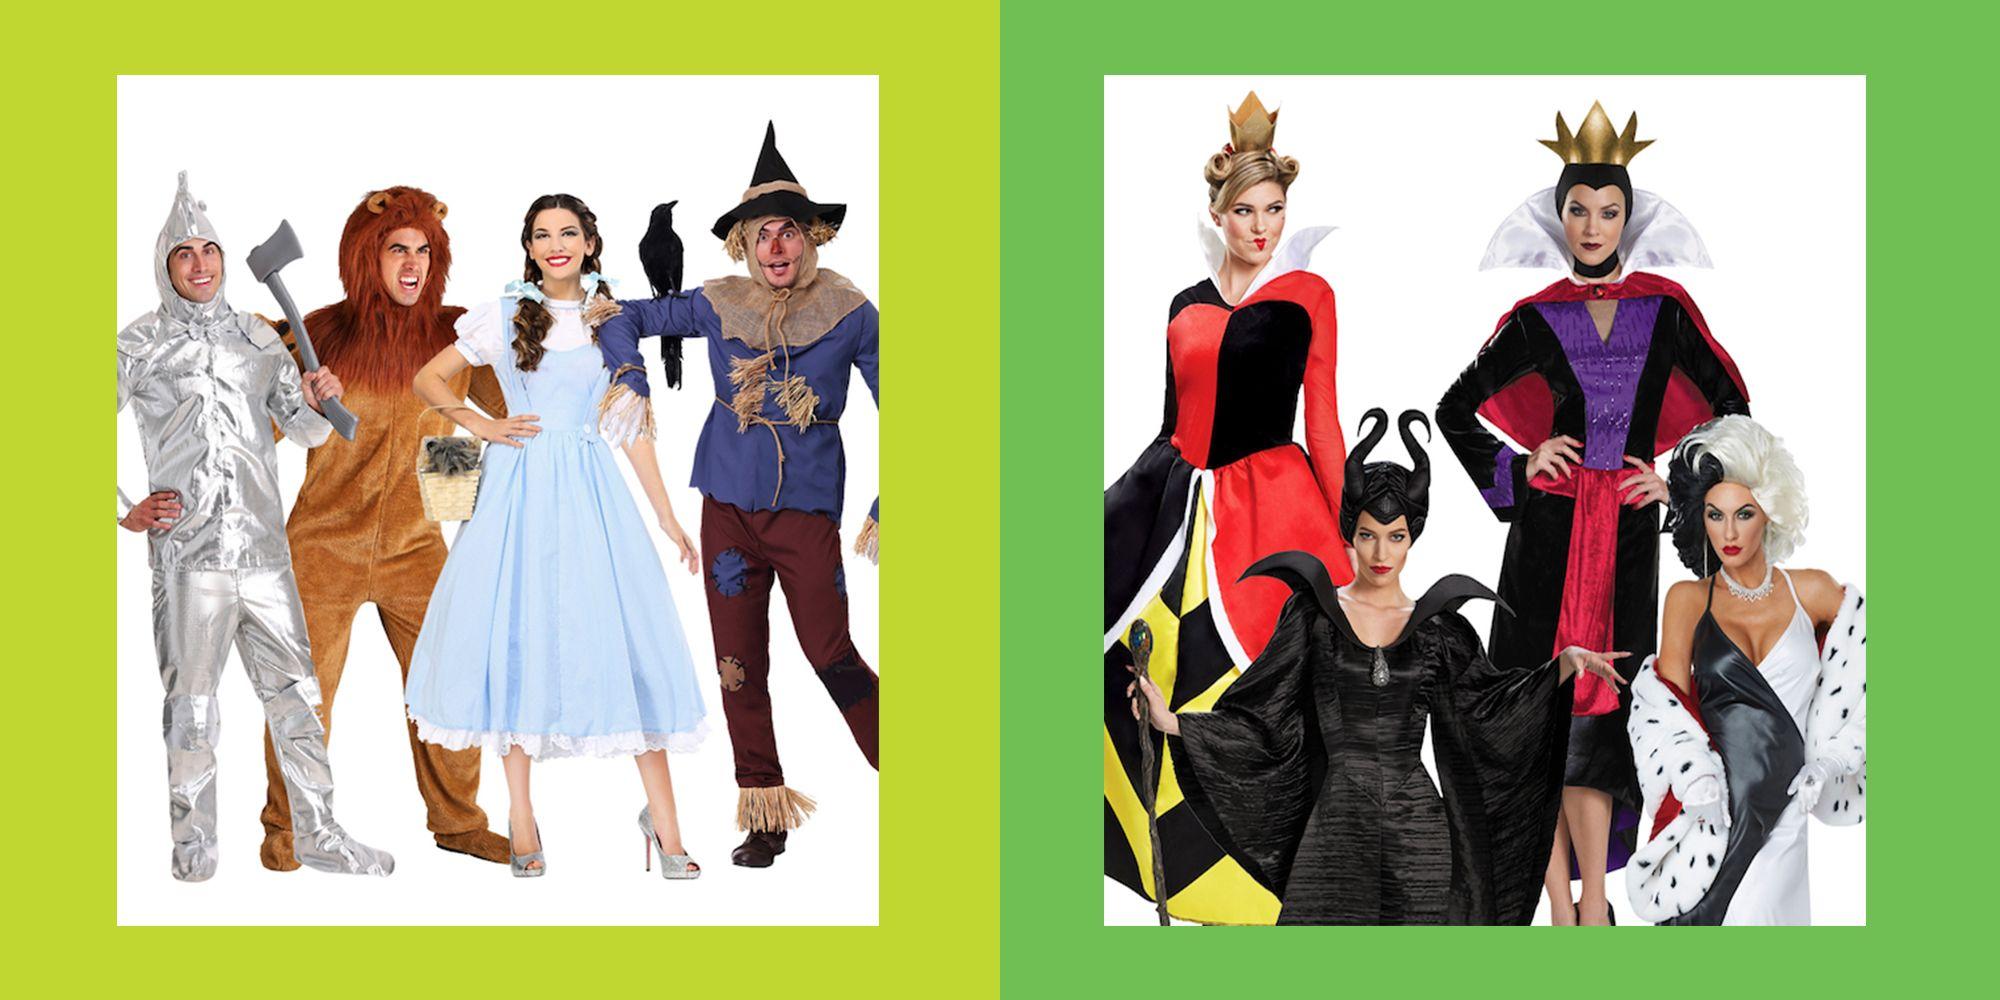 aa1ccdf52fc Cute Group Halloween Costume Ideas - Easy Friend Halloween Costumes